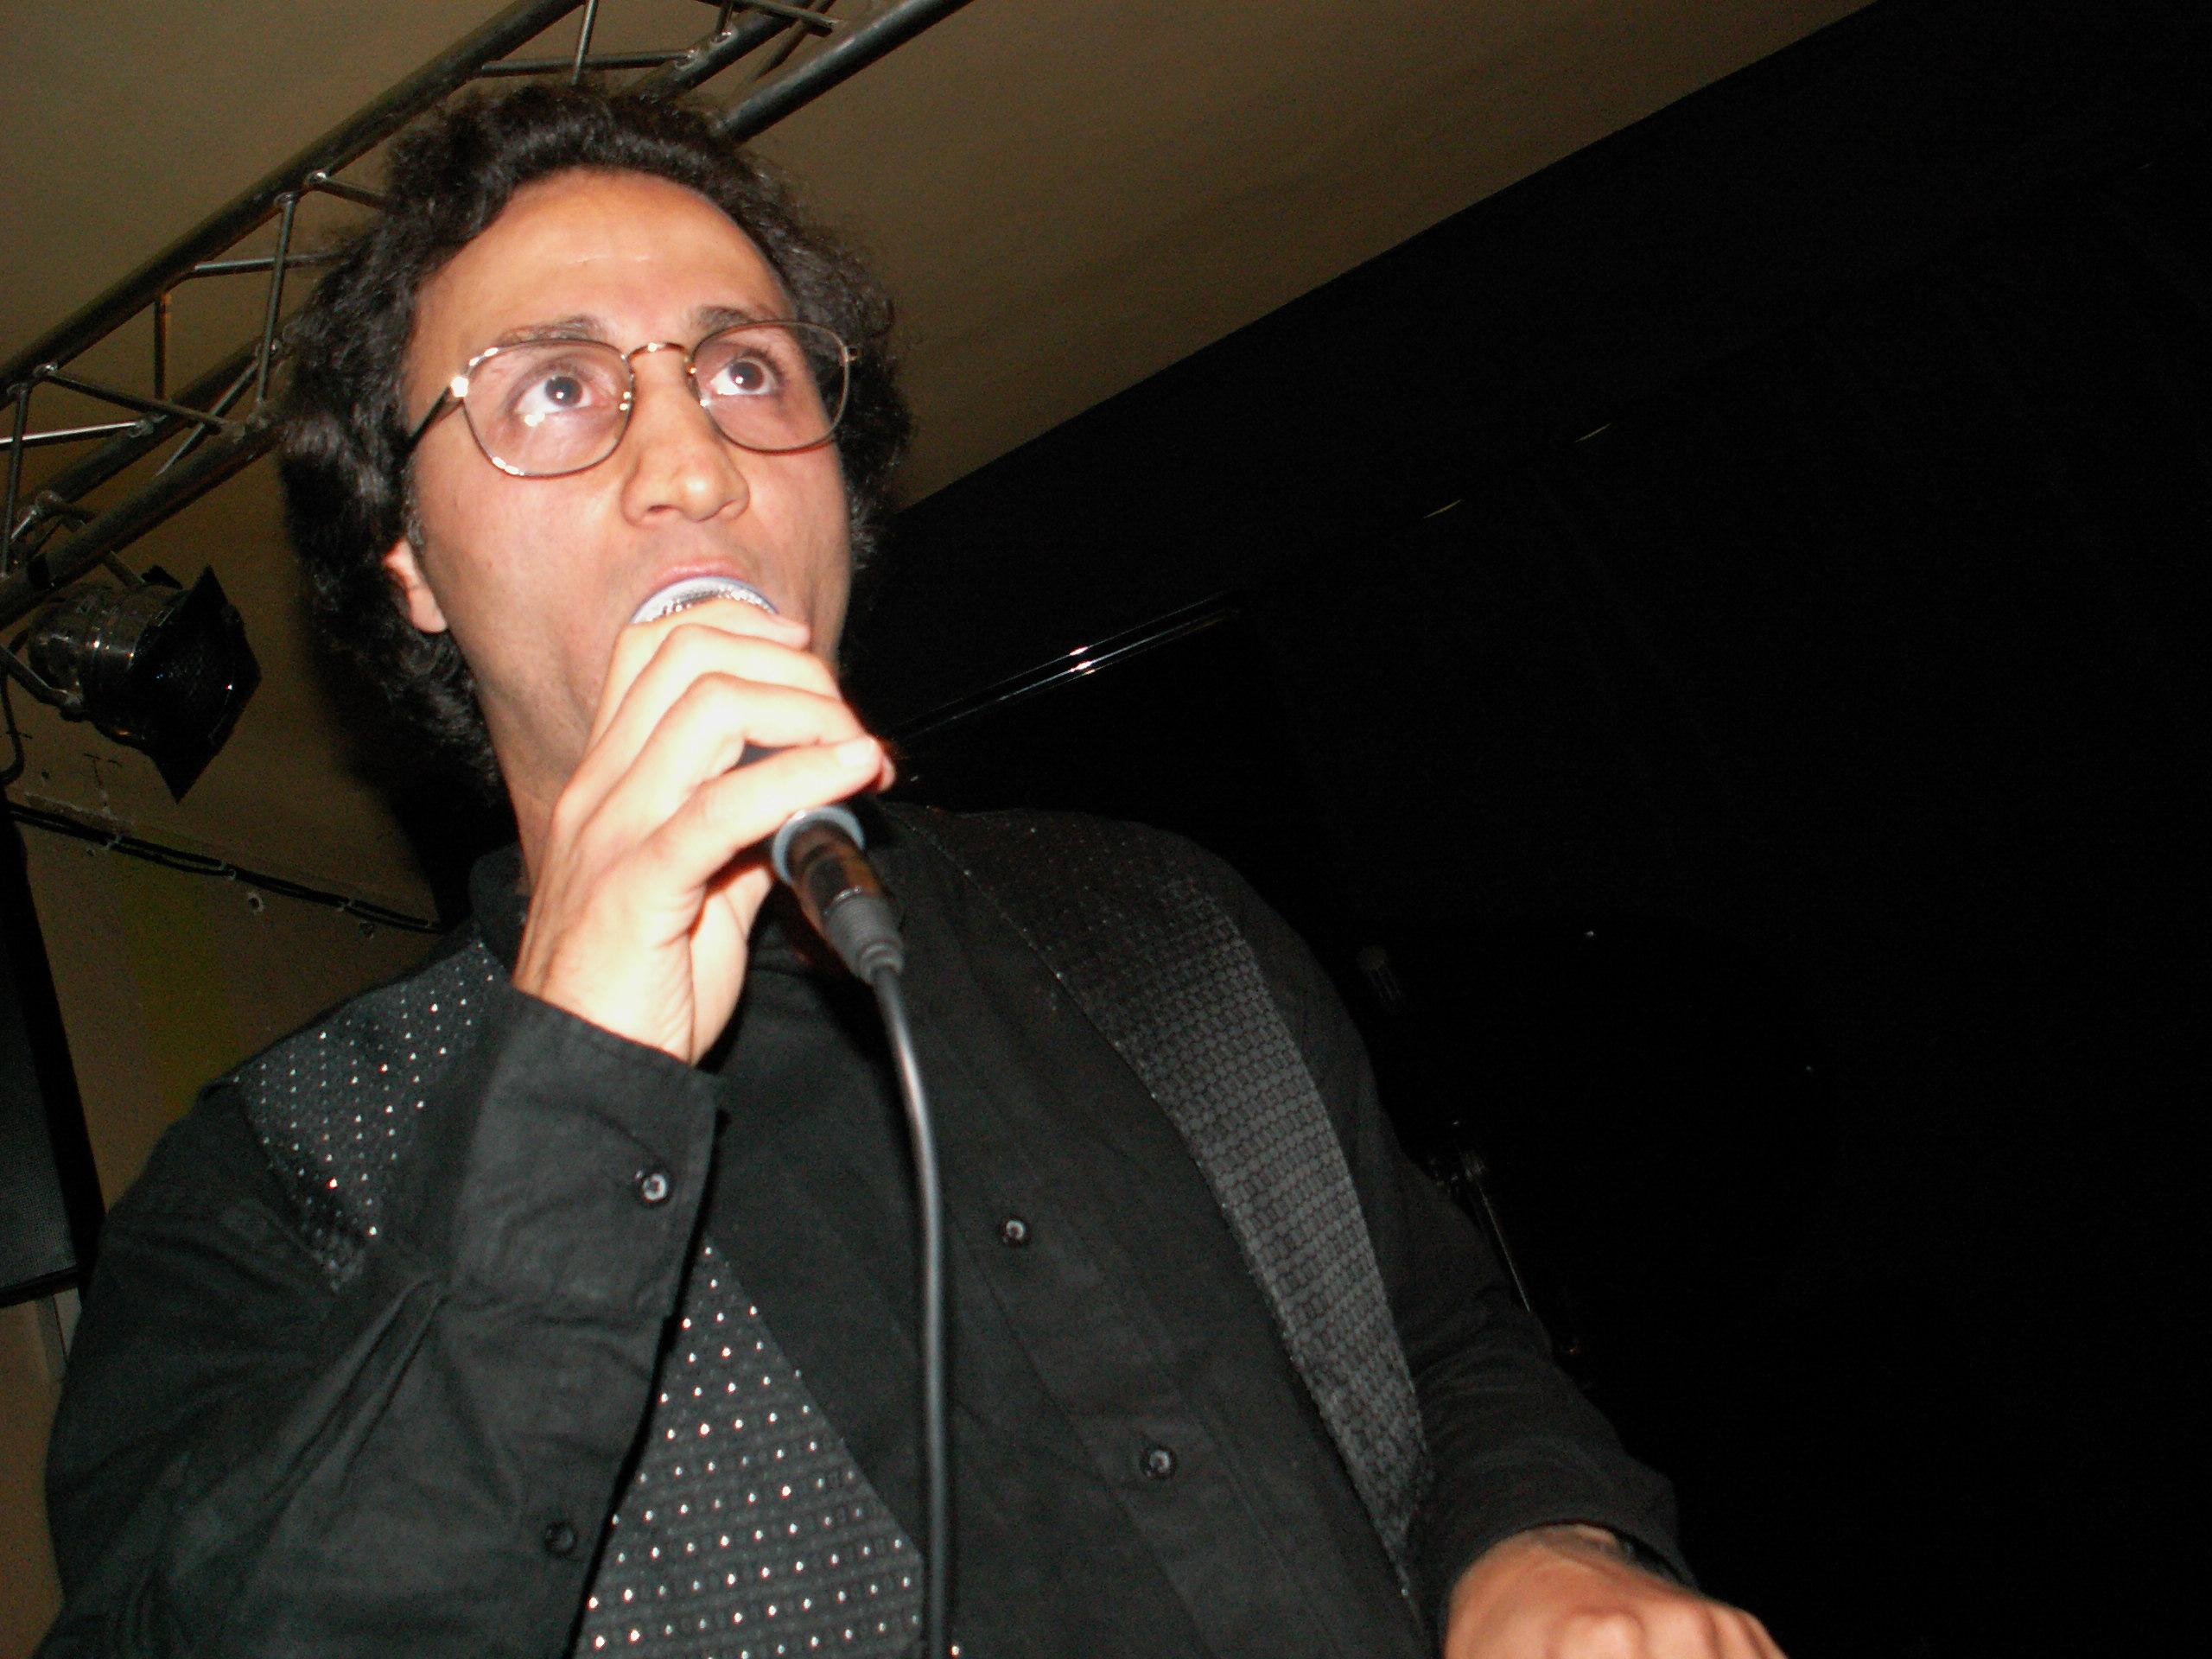 Antonio Testa, scat improvisation